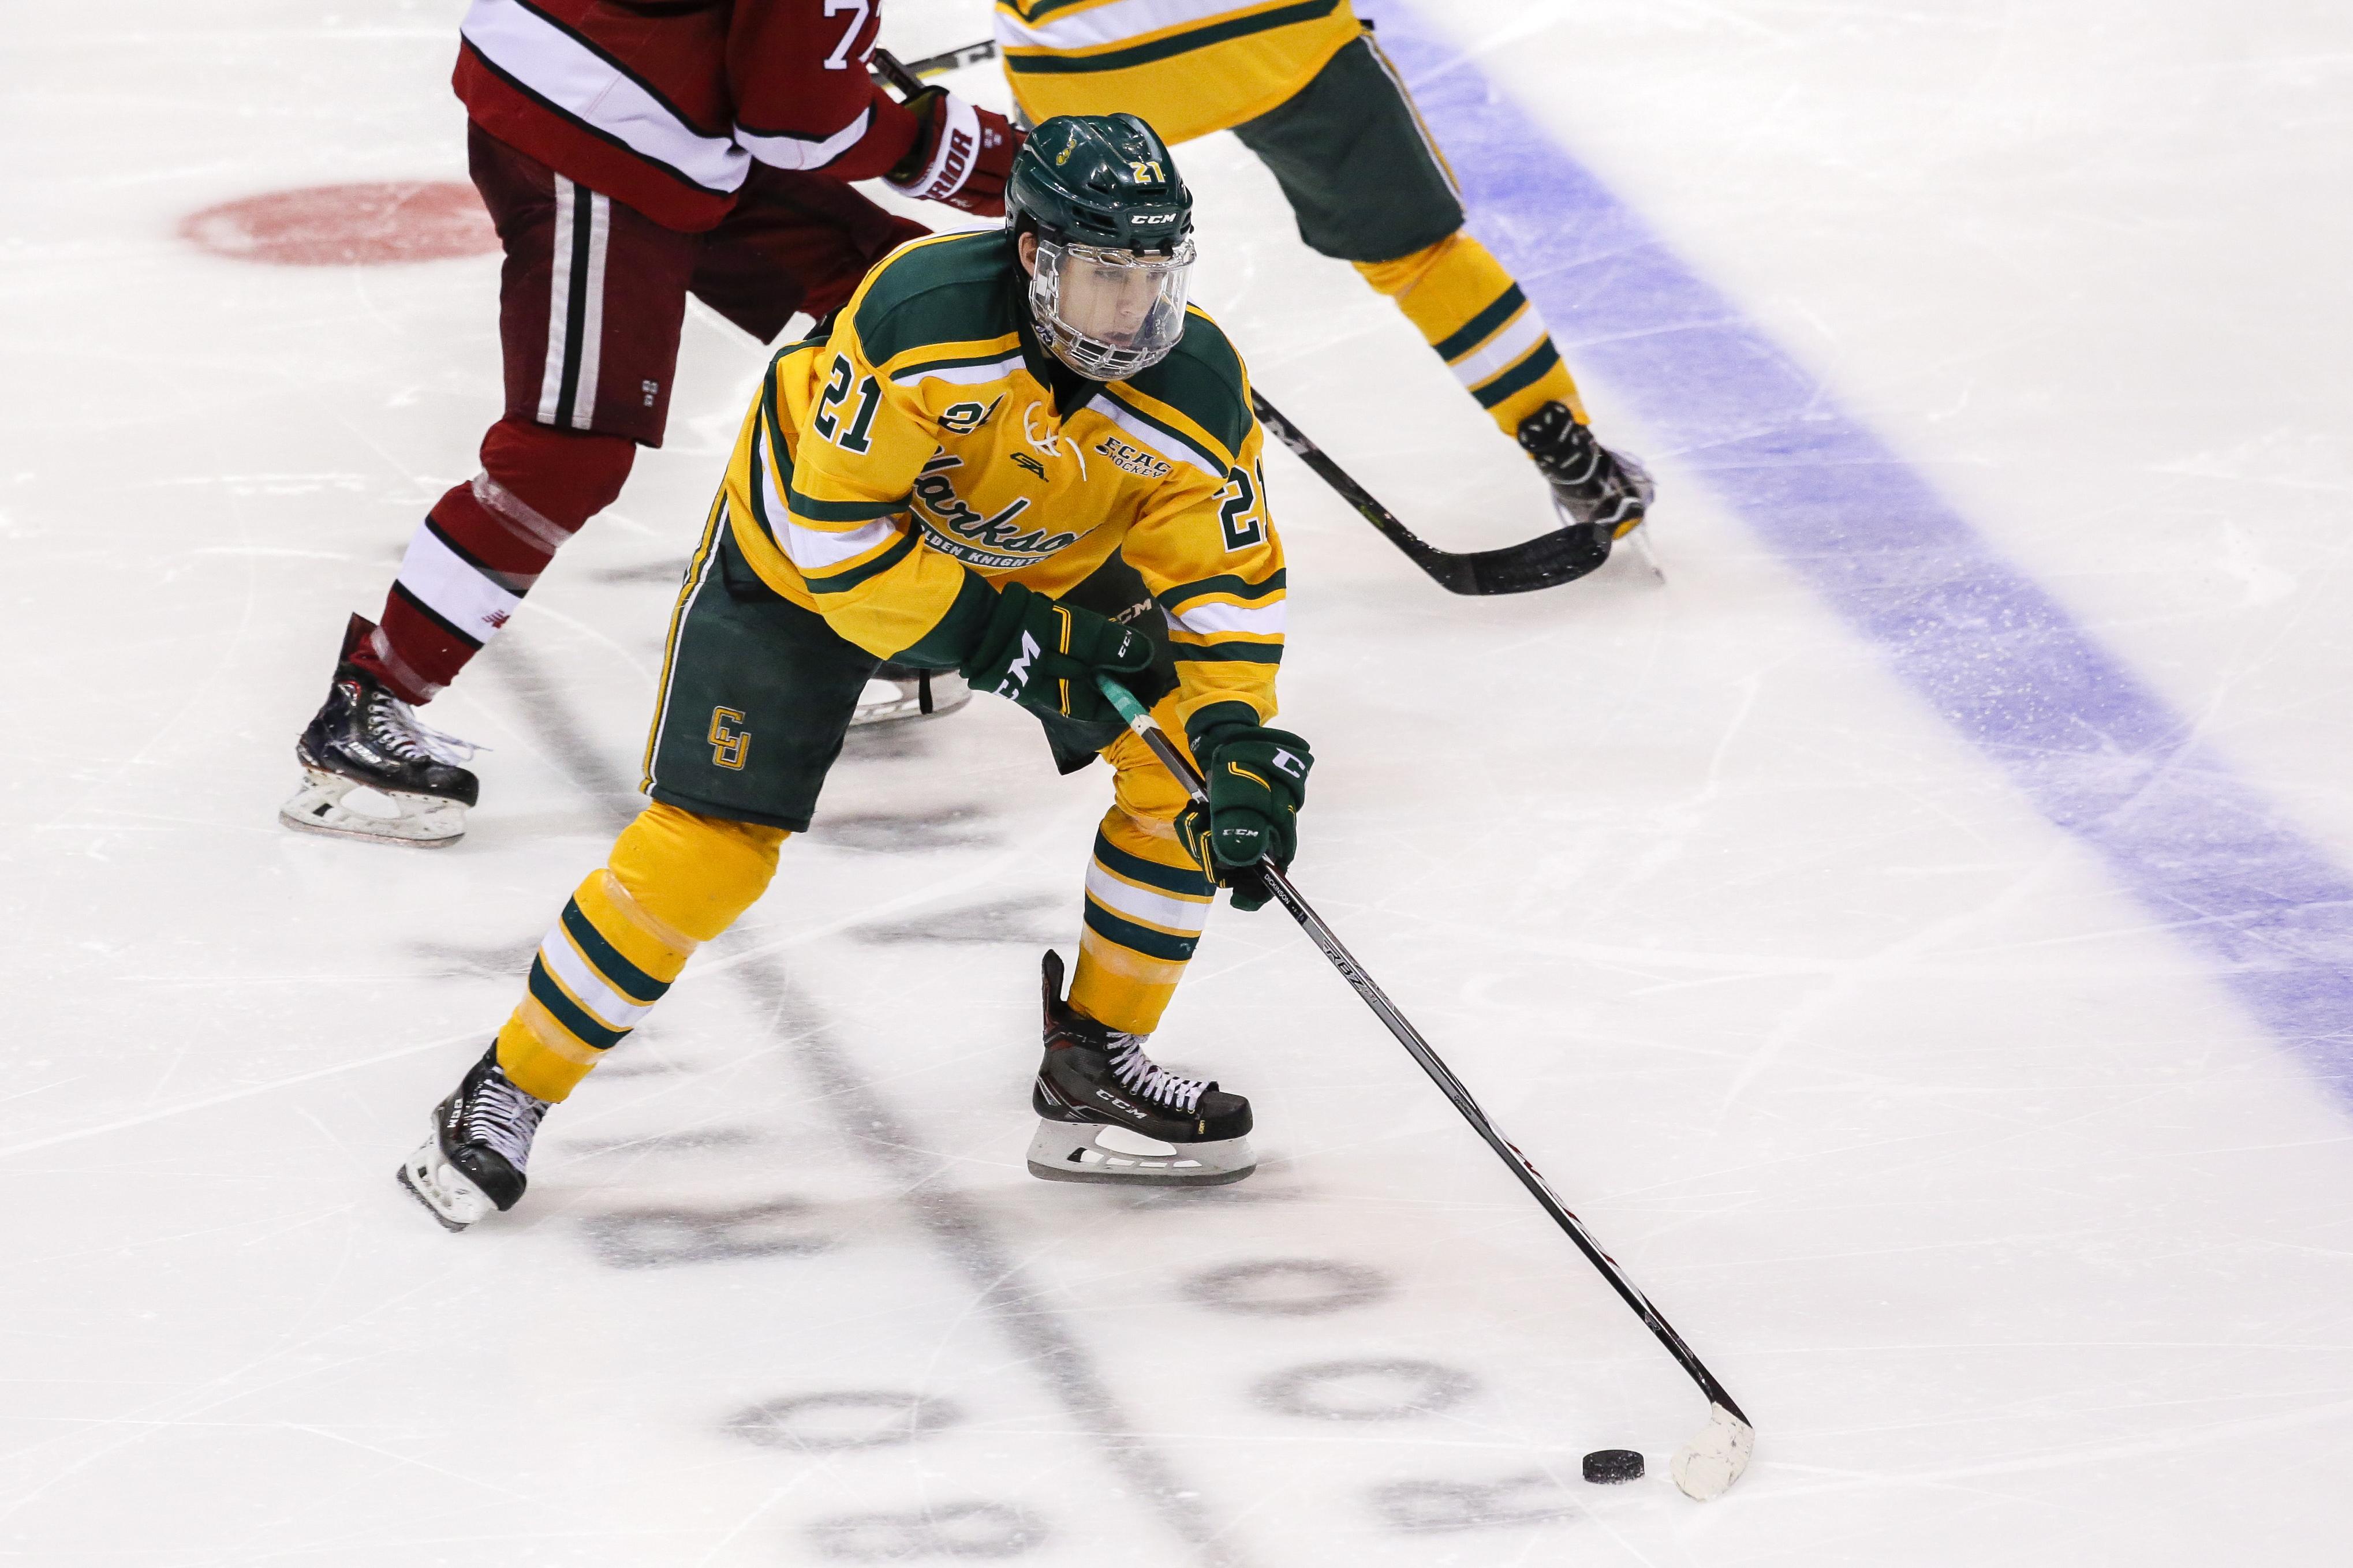 COLLEGE HOCKEY: MAR 16 ECAC Hockey Championship - Harvard v Clarkson